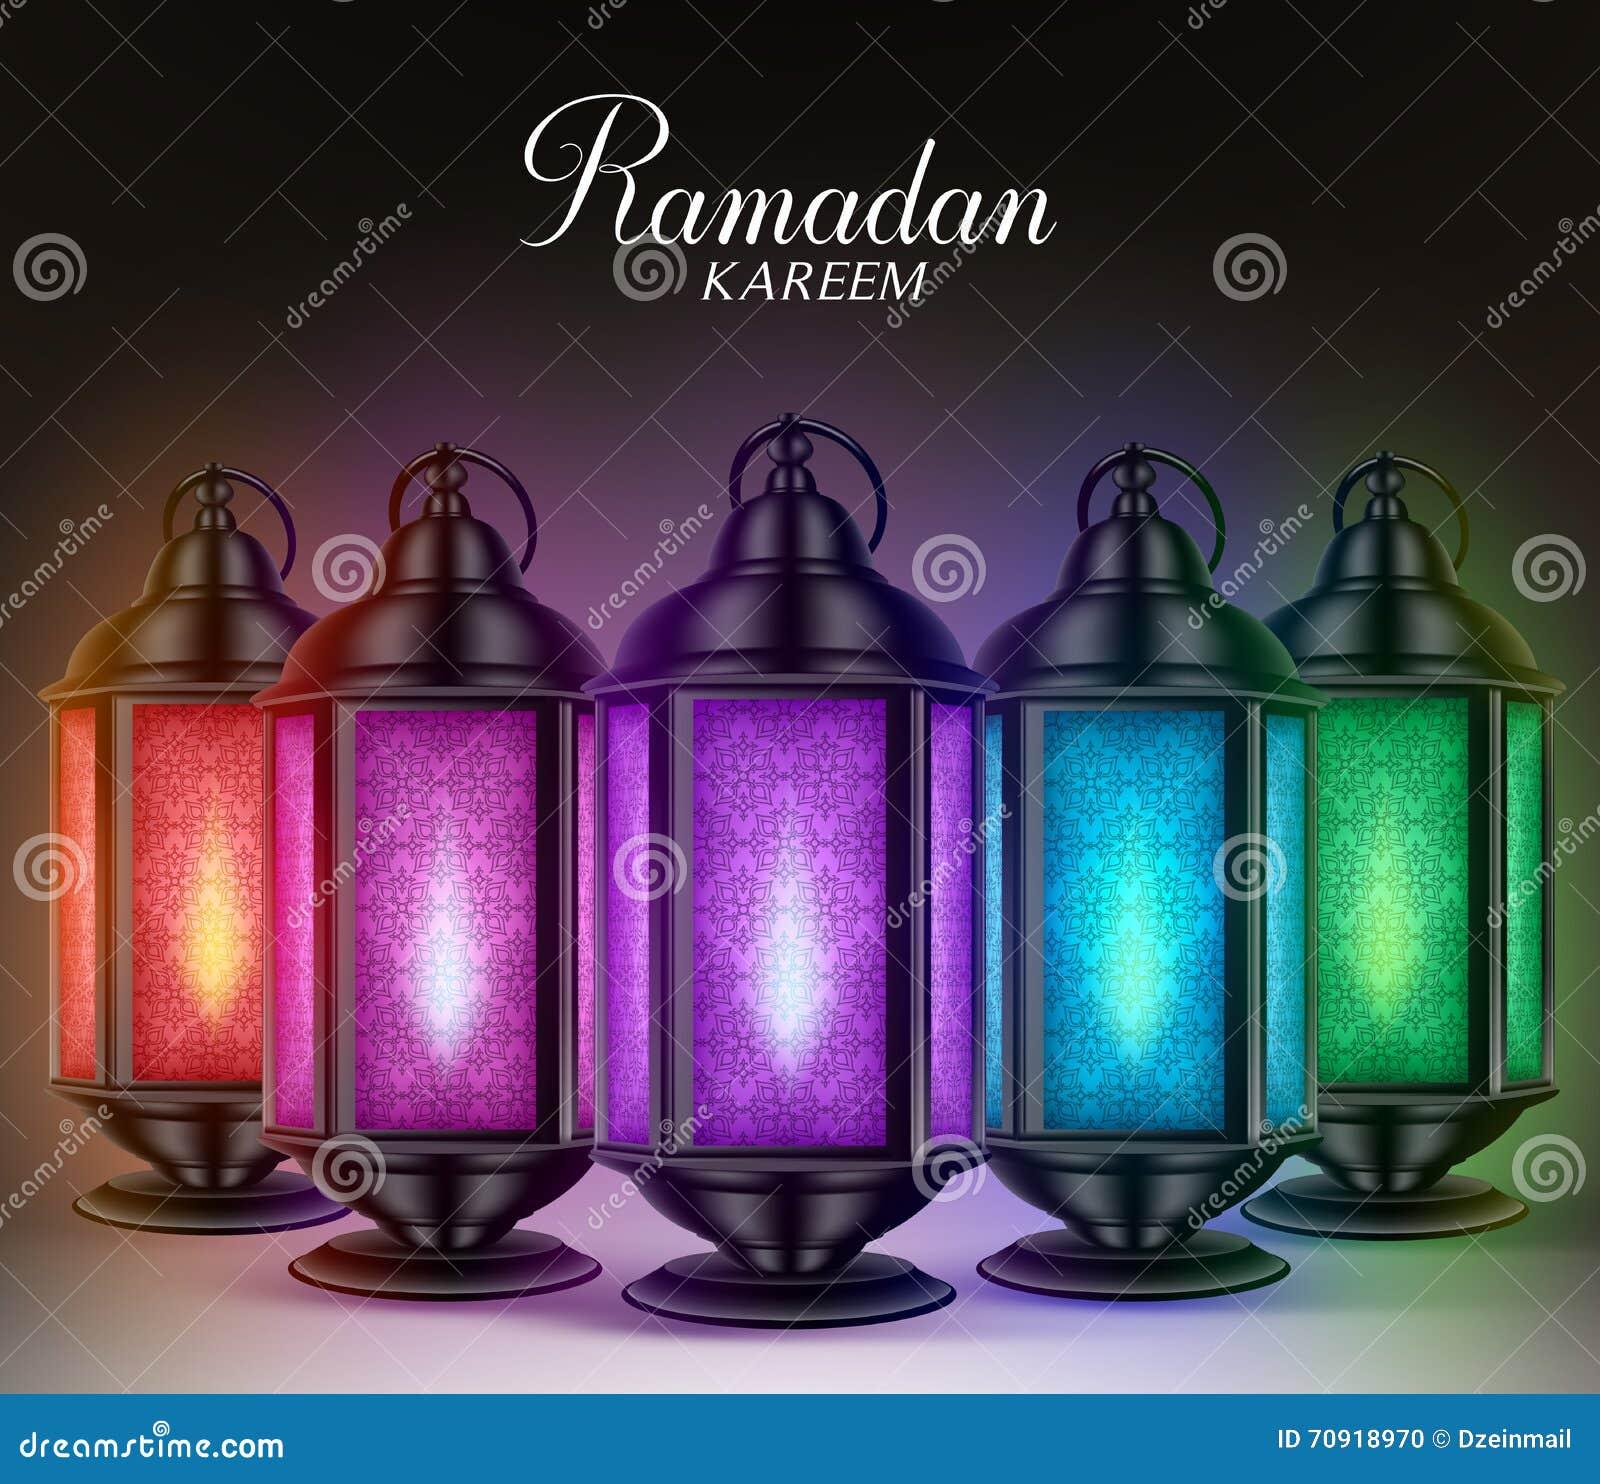 Ramadan greetings in arabic scriptdilfitri graphic design colorful set of ramadan lanterns or fanous with lights and ramadan kareem greetings stock photo kristyandbryce Image collections